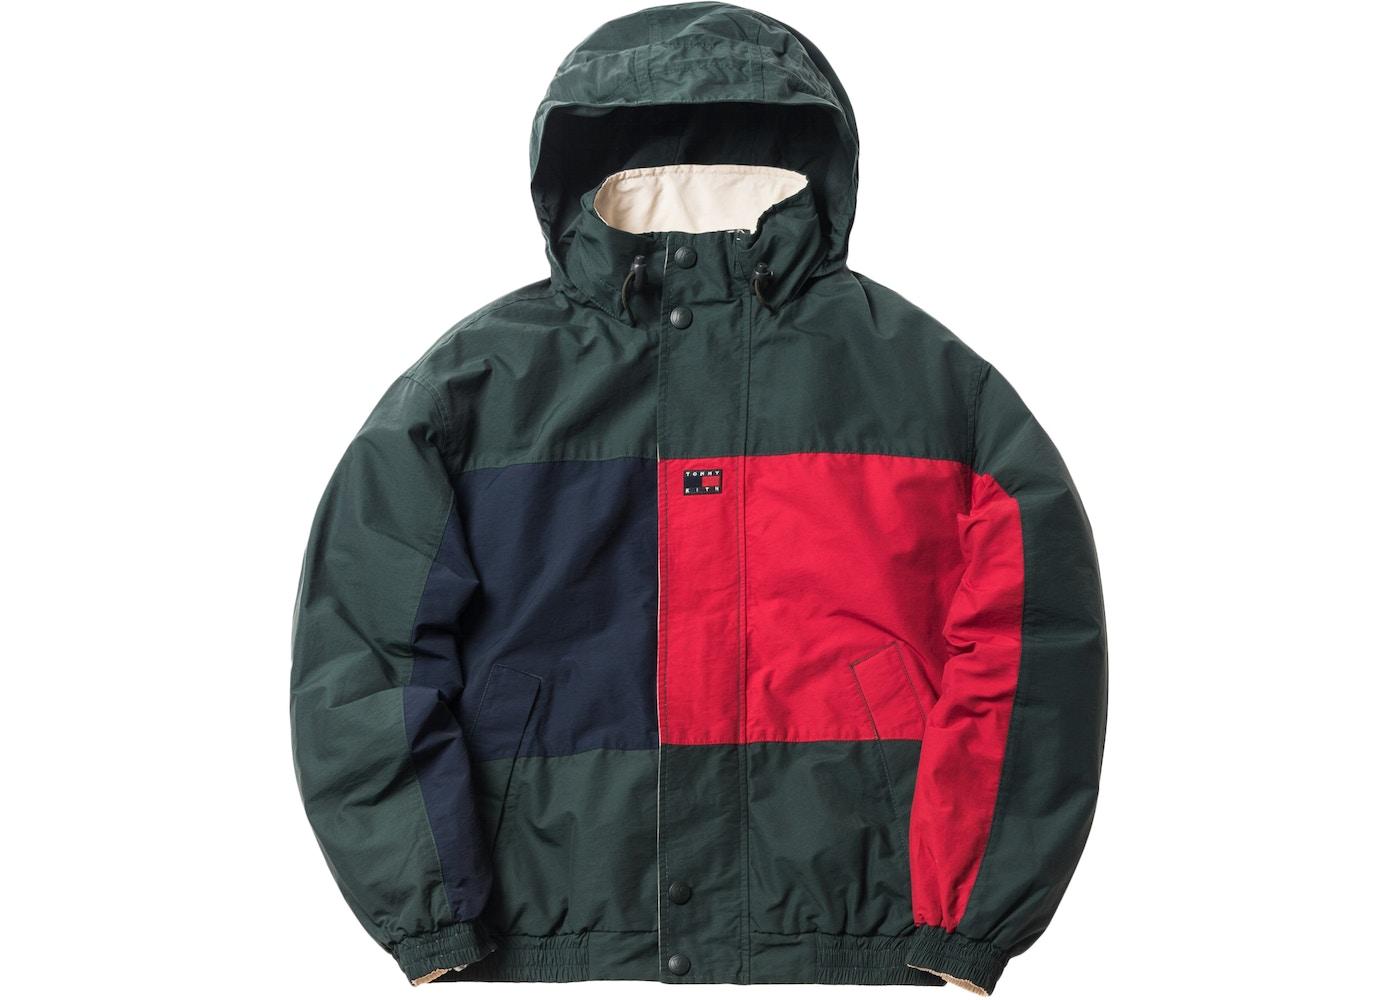 neue Season großer Rabatt überlegene Leistung Kith x Tommy Hilfiger Reversible Colorblack Jacket Forest/Cream